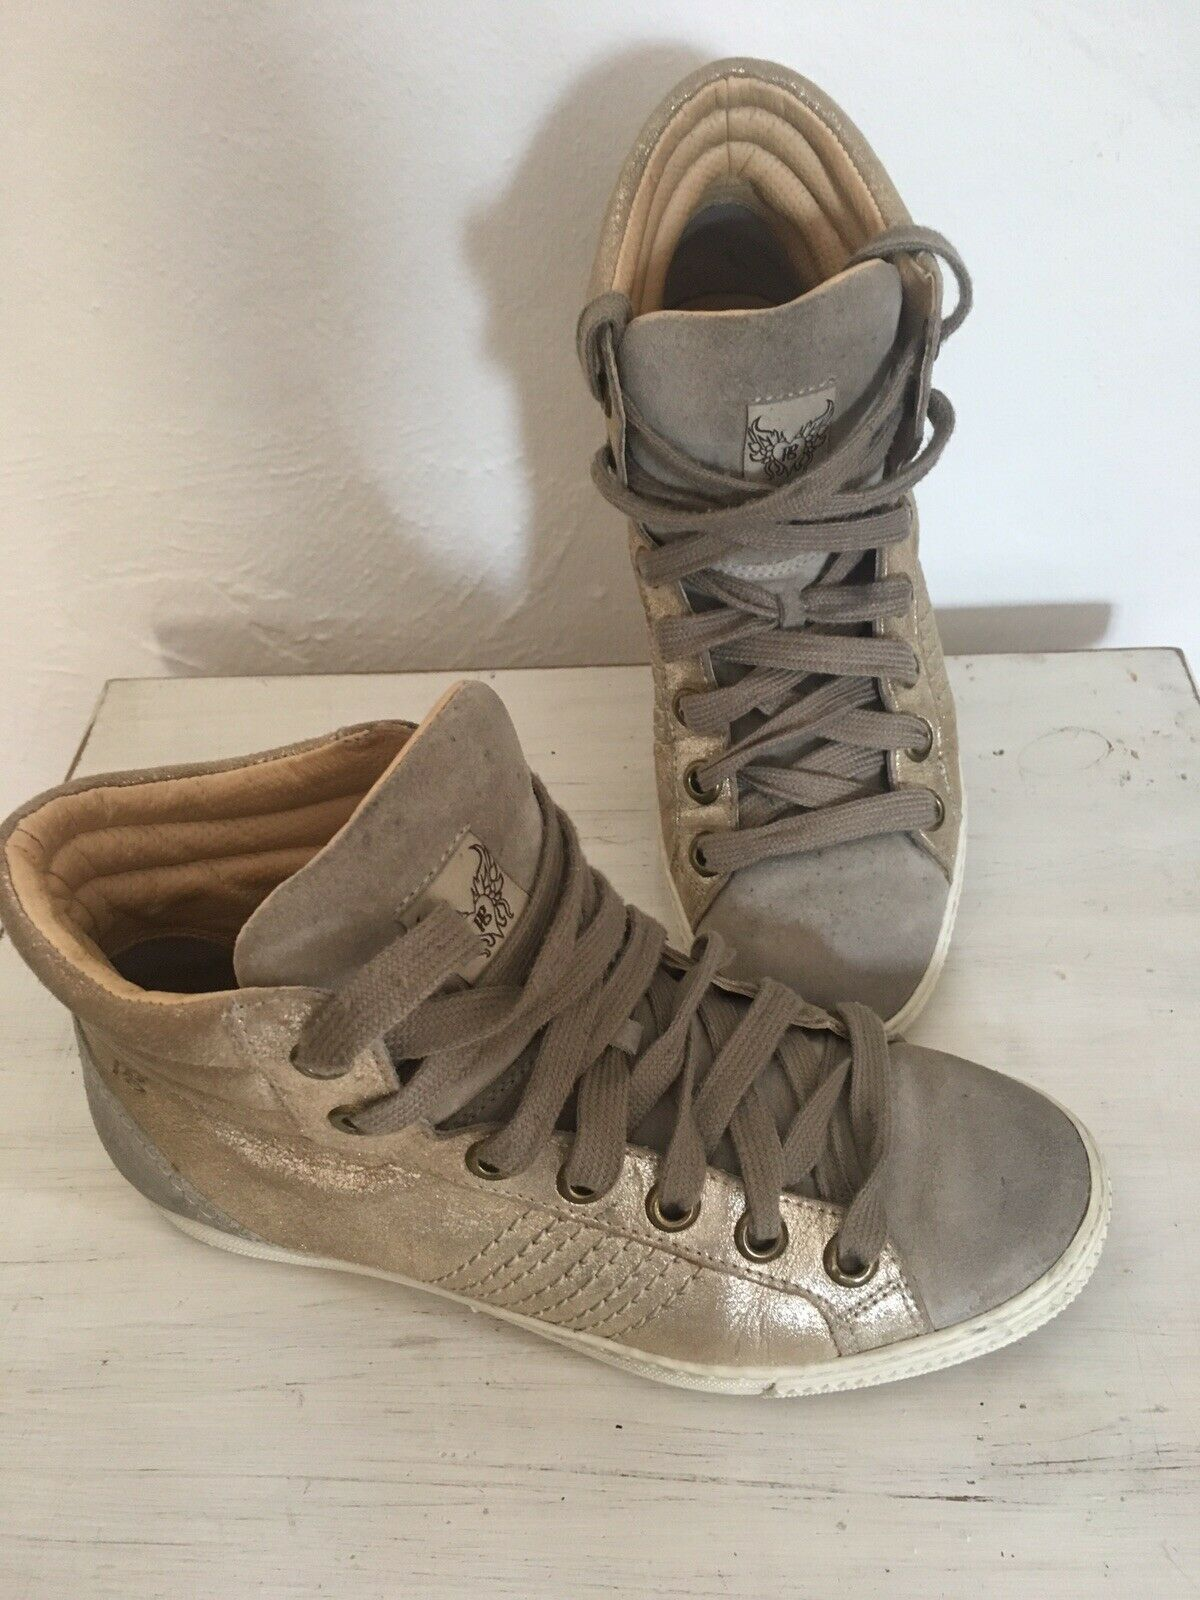 Tamaris Damen Sandalette High Heels 28311-26 Gold Reptilienoptik elegant